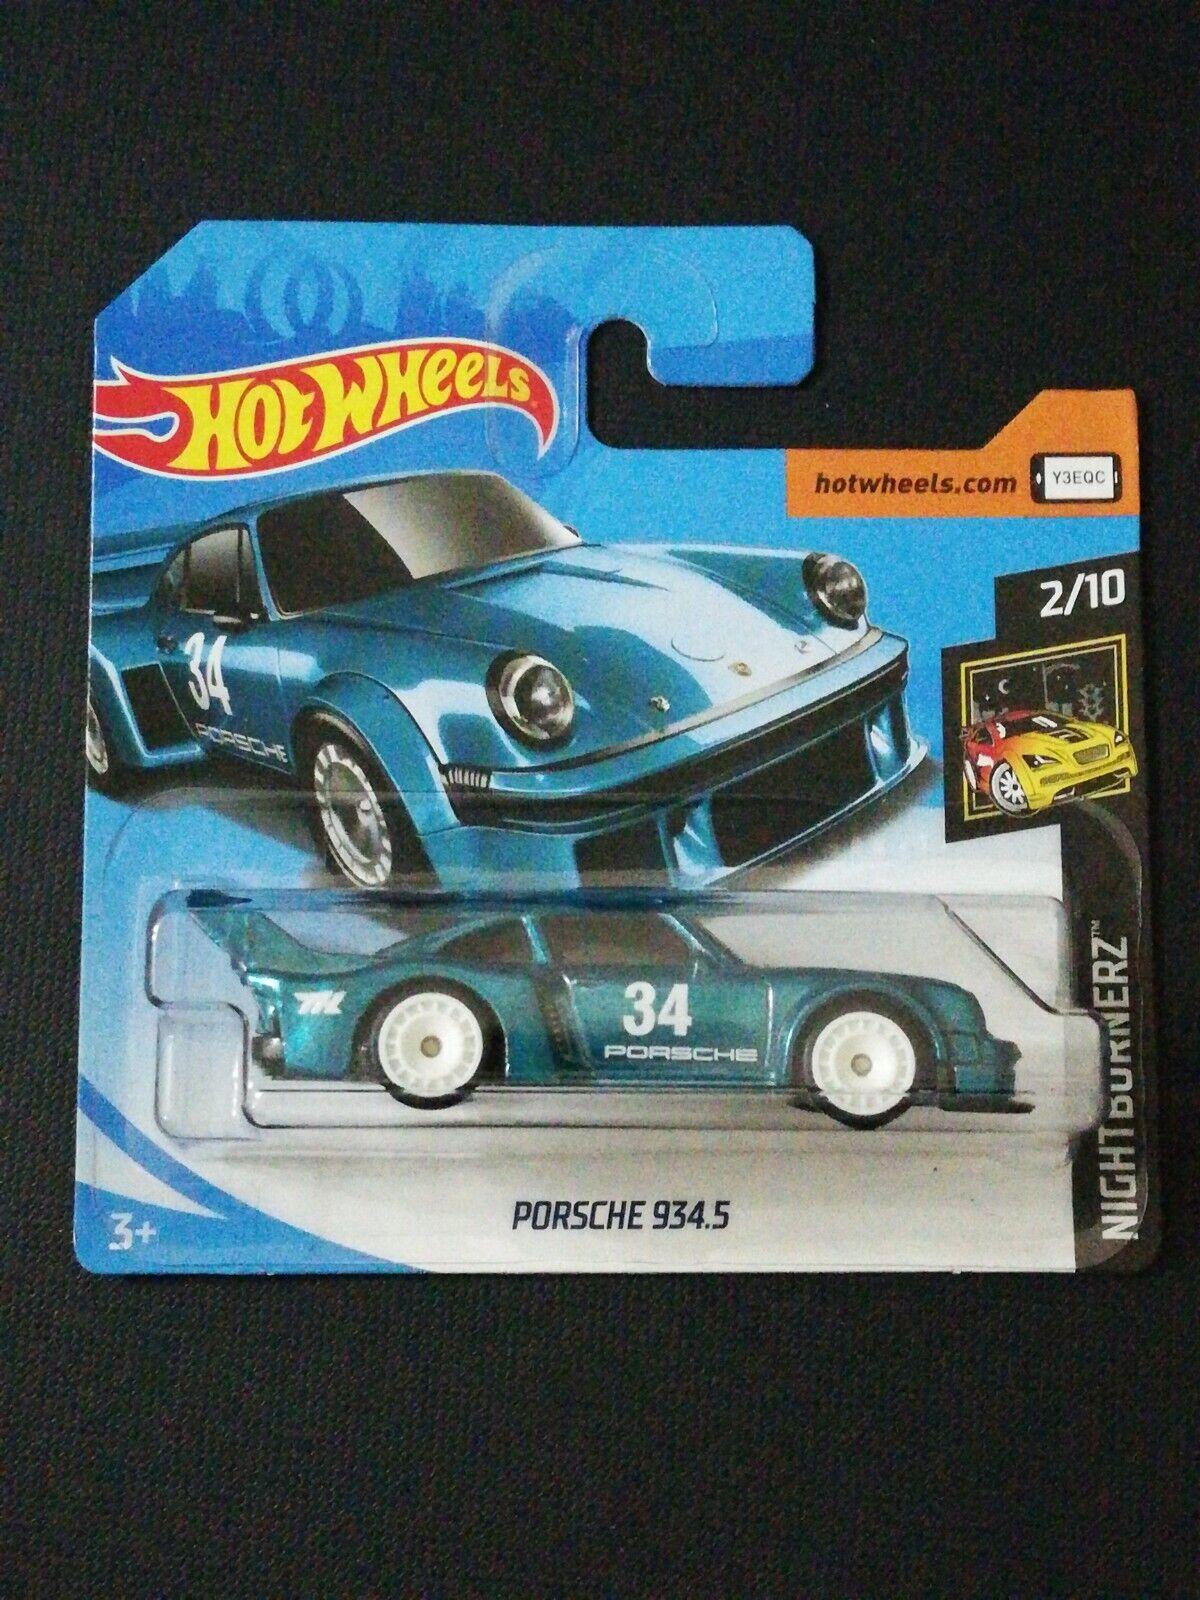 Esperando por ti Hot Wheels Wheels Wheels 2018 súper Treasure caza Porsche 934.5 Tarjeta Corta VHTF RARE  bajo precio